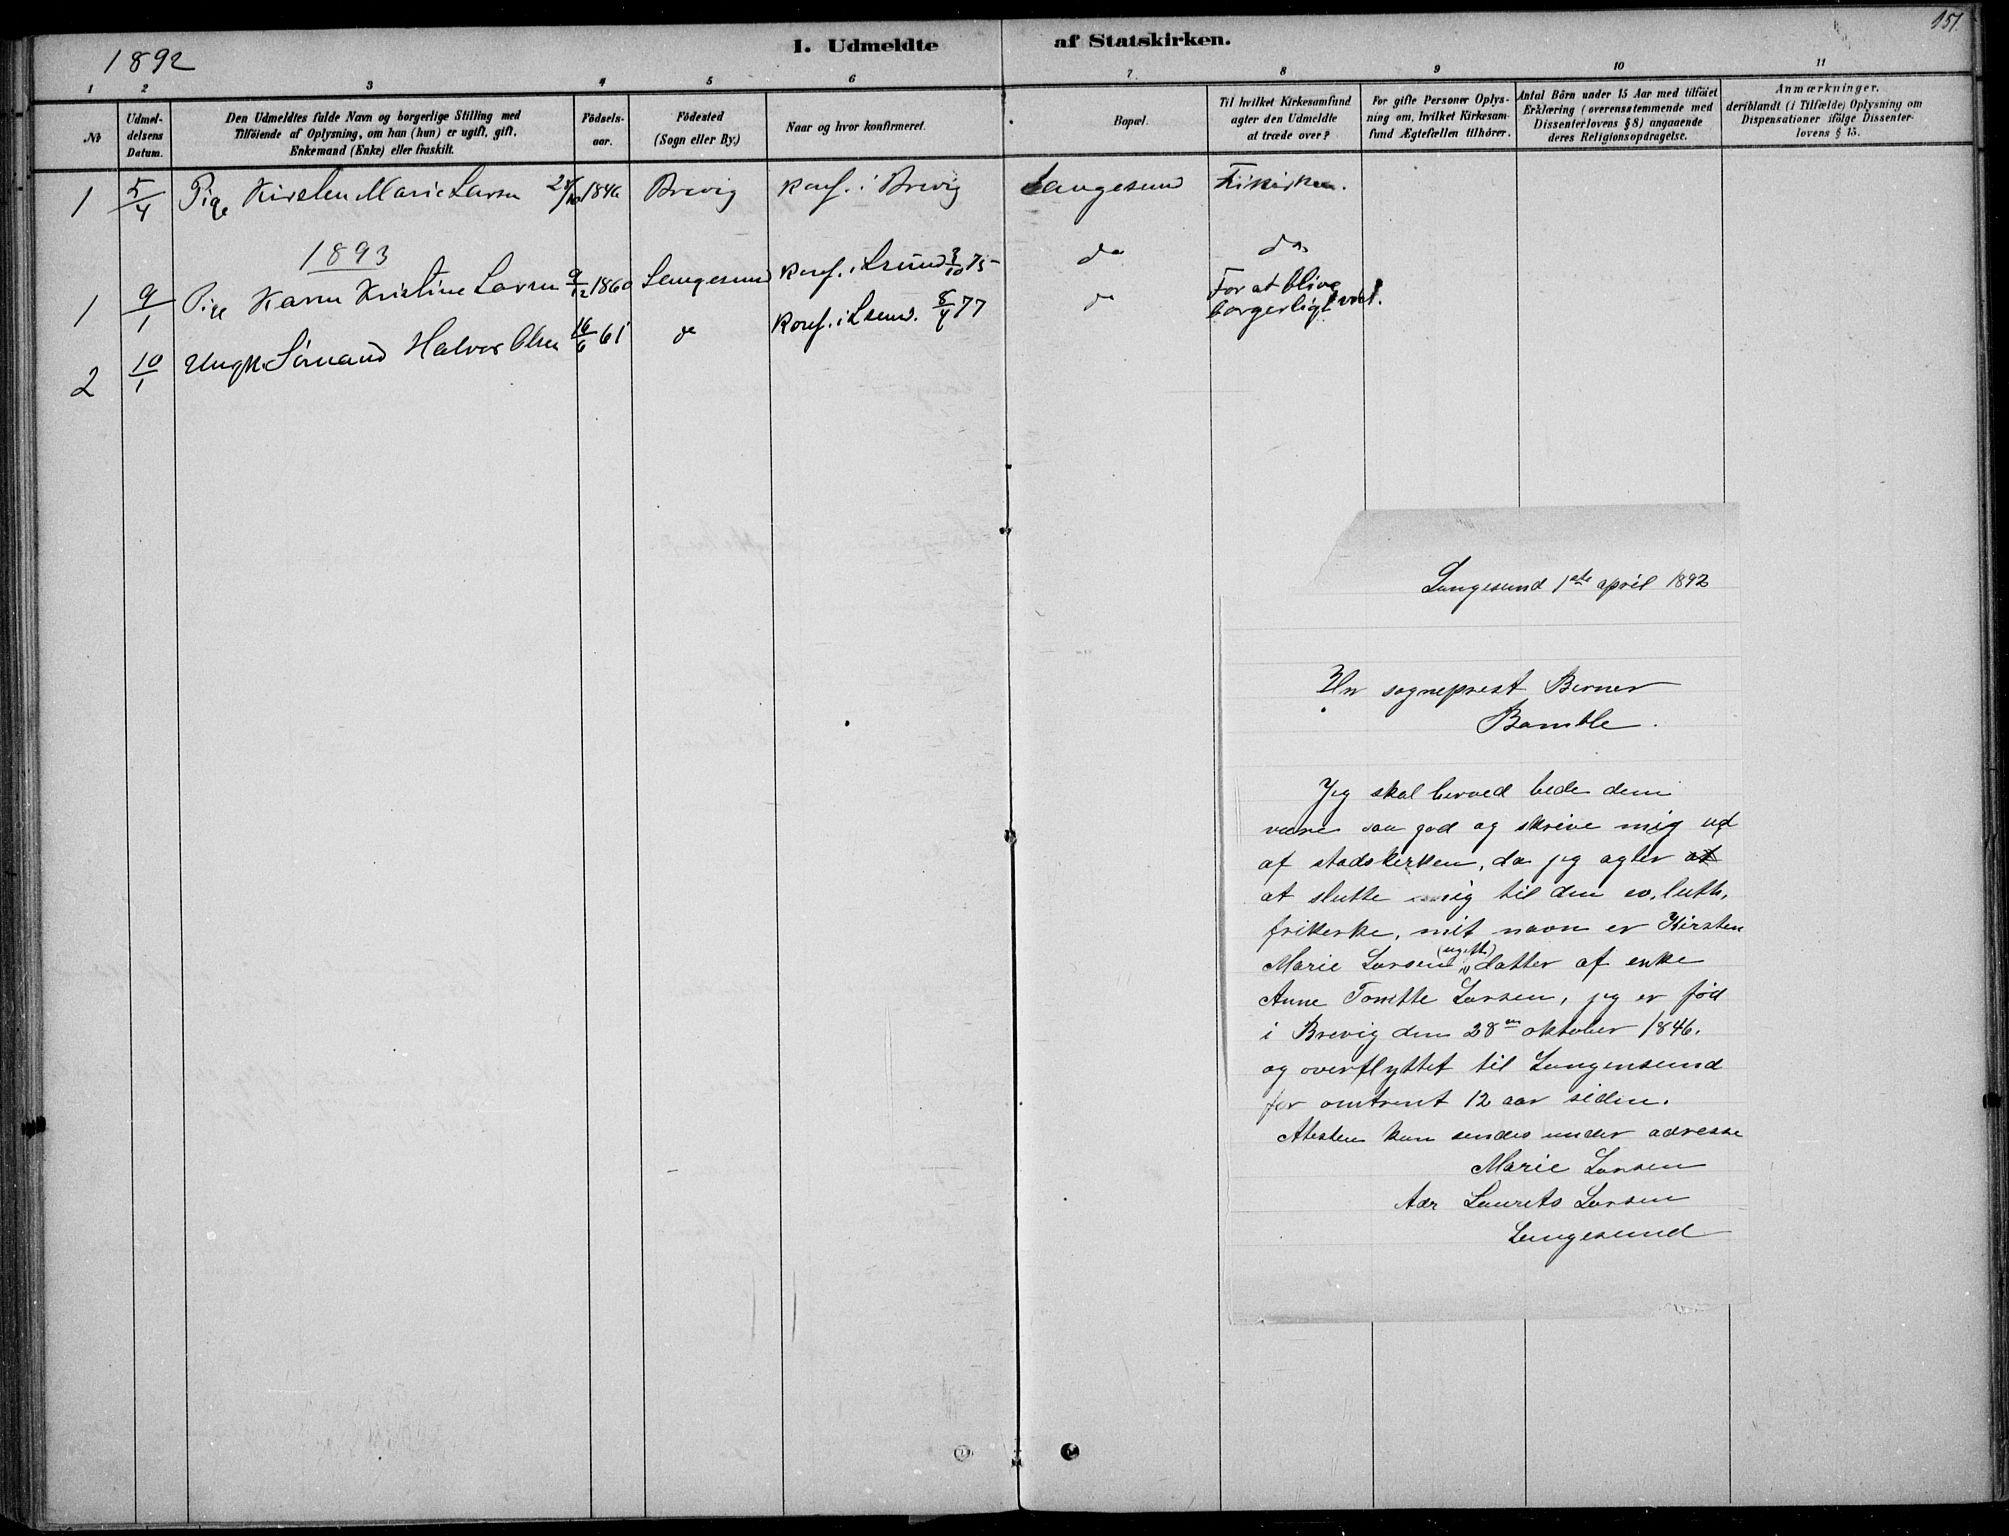 SAKO, Langesund kirkebøker, F/Fa/L0002: Ministerialbok nr. 2, 1878-1892, s. 151